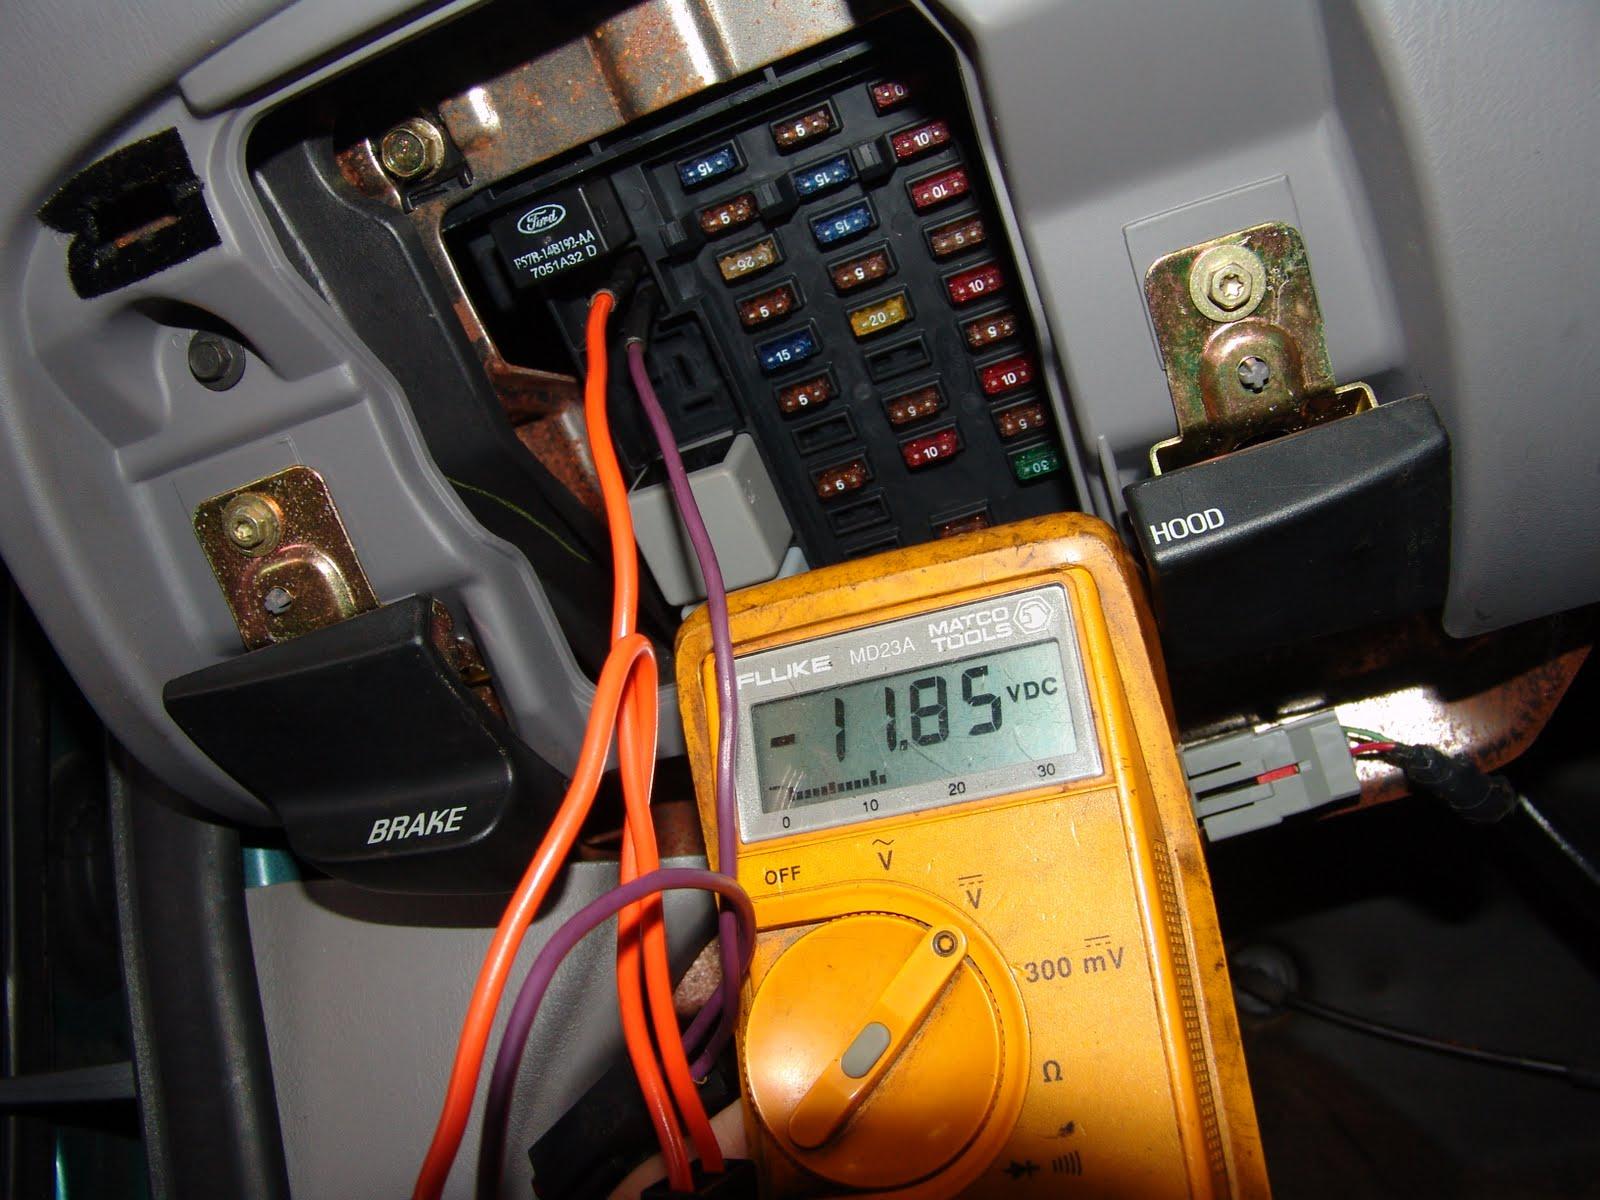 wiring diagram 1996 dodge ram 1500 door locks wiring dsc 4020 wiring diagram dsc 1500 wiring diagram